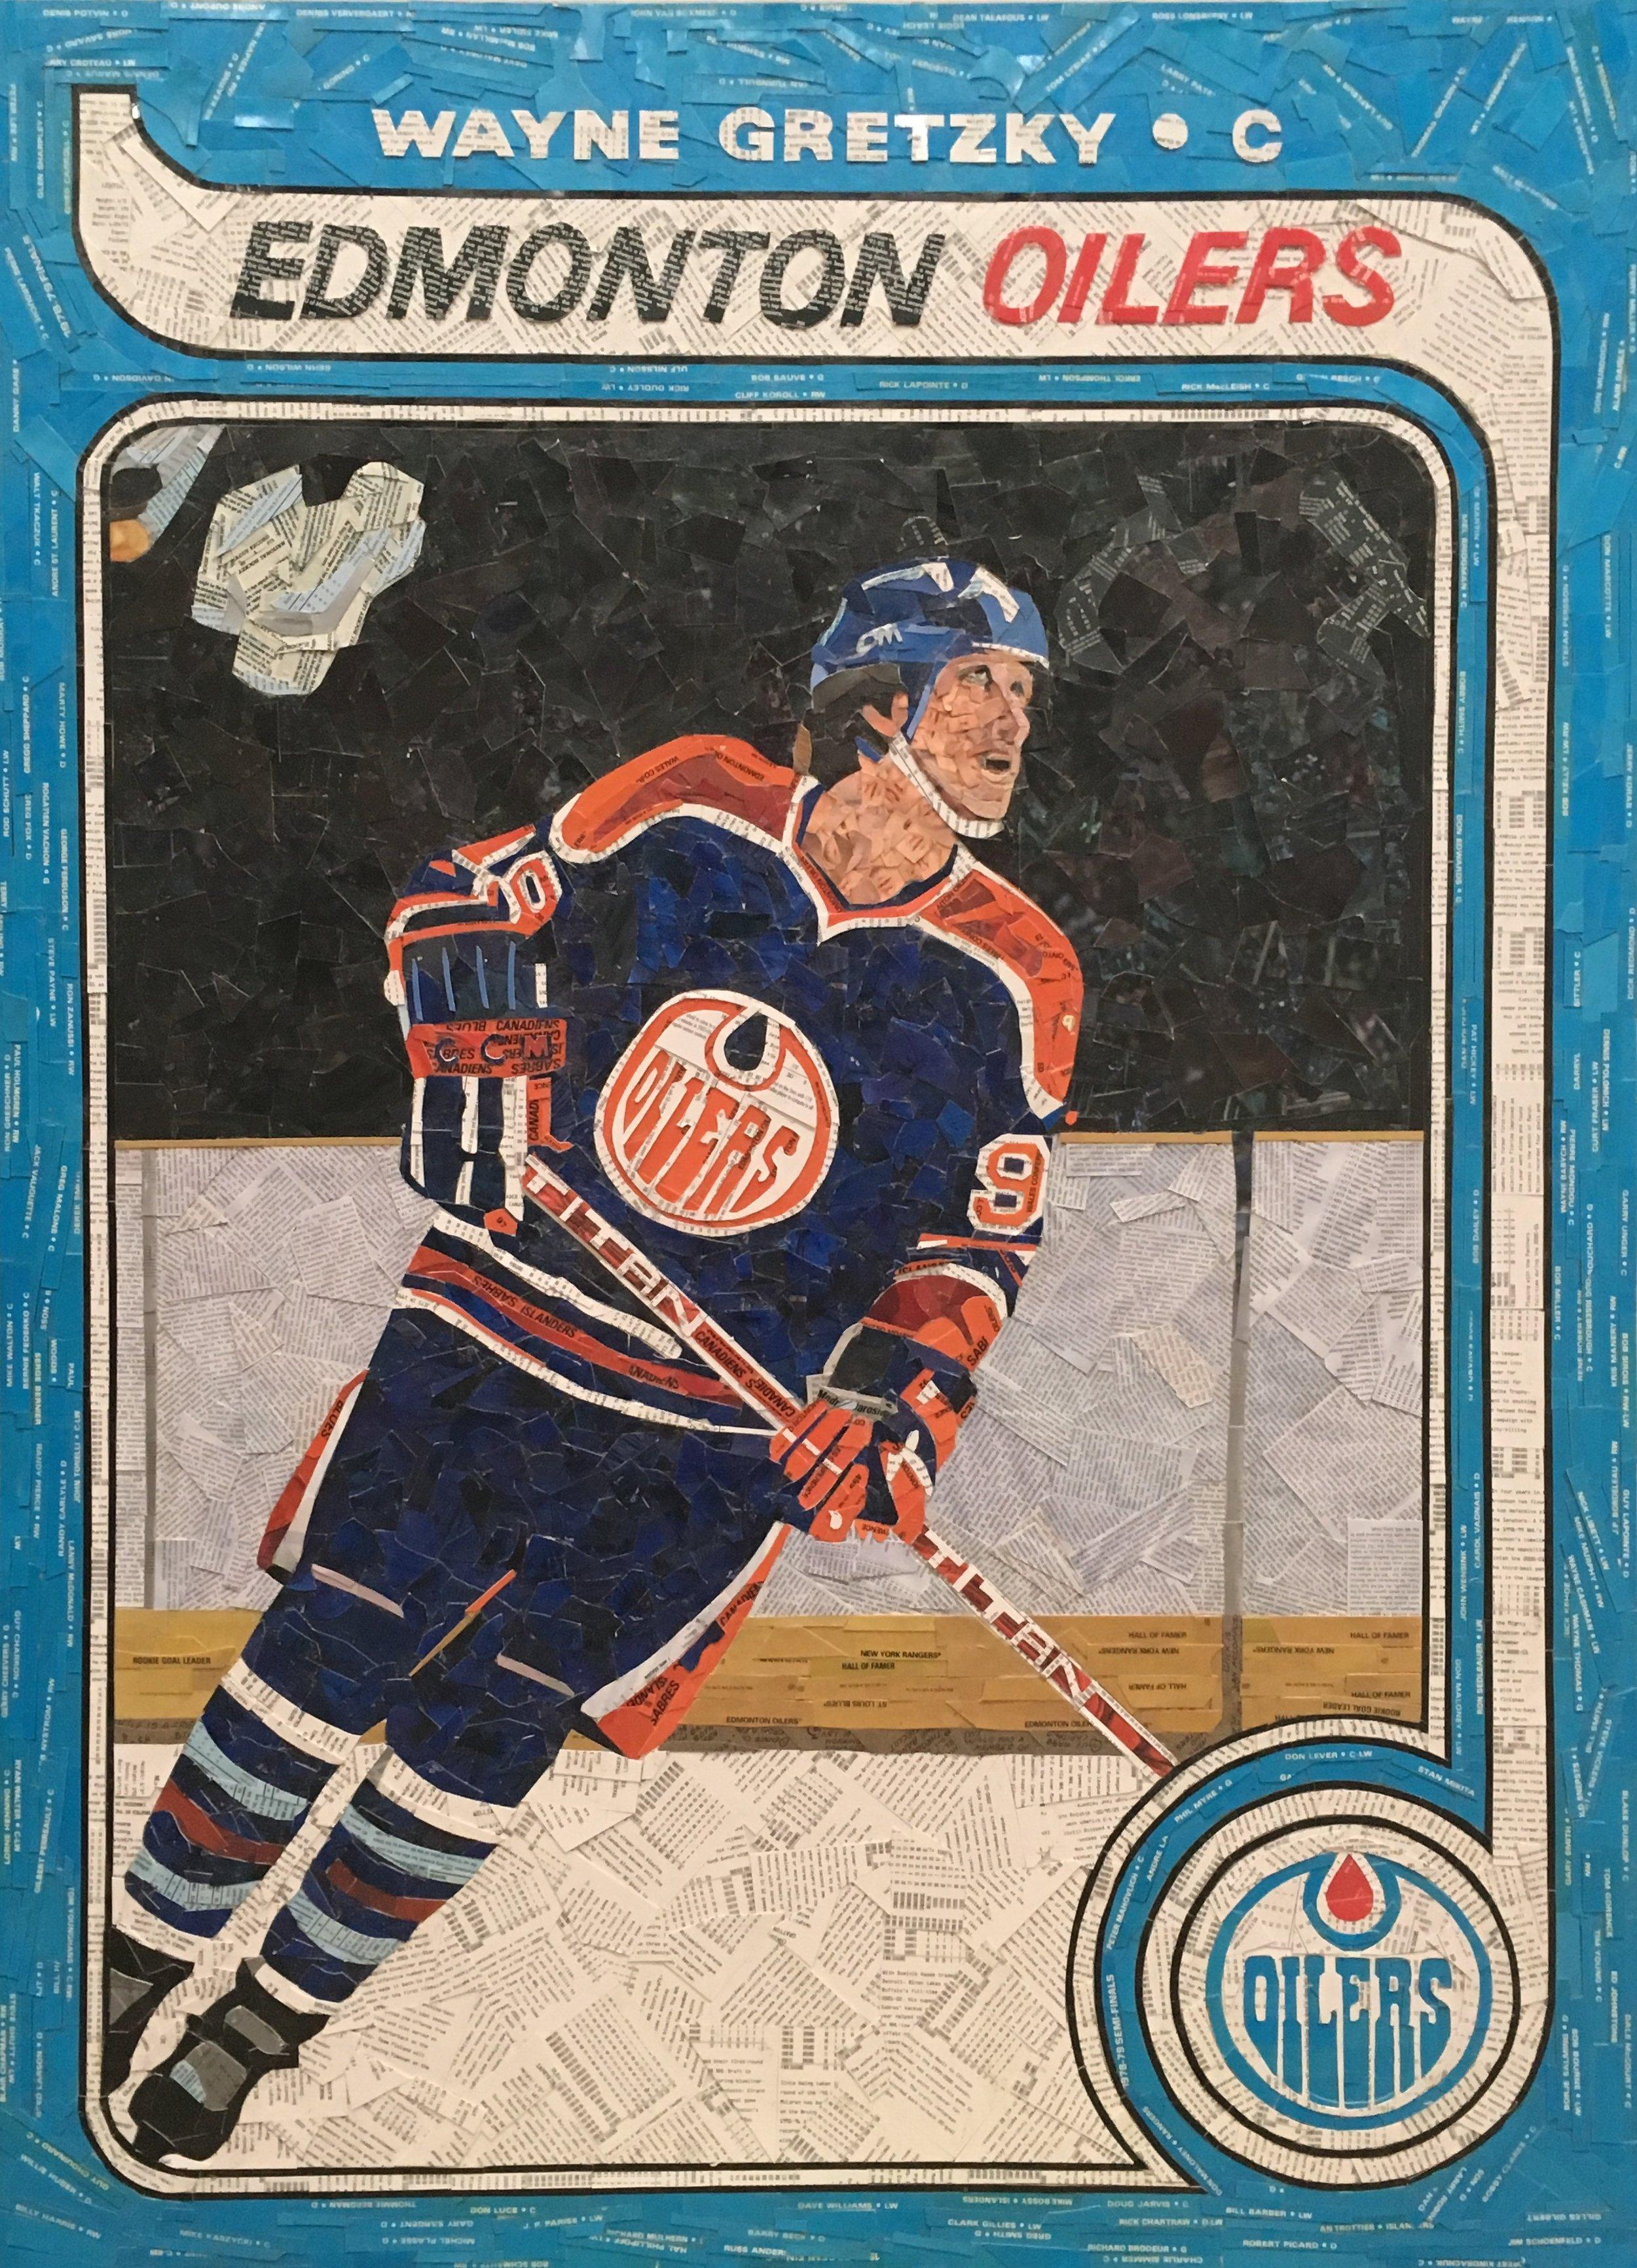 1979-80 O-Pee-Chee Wayne Gretzky RC